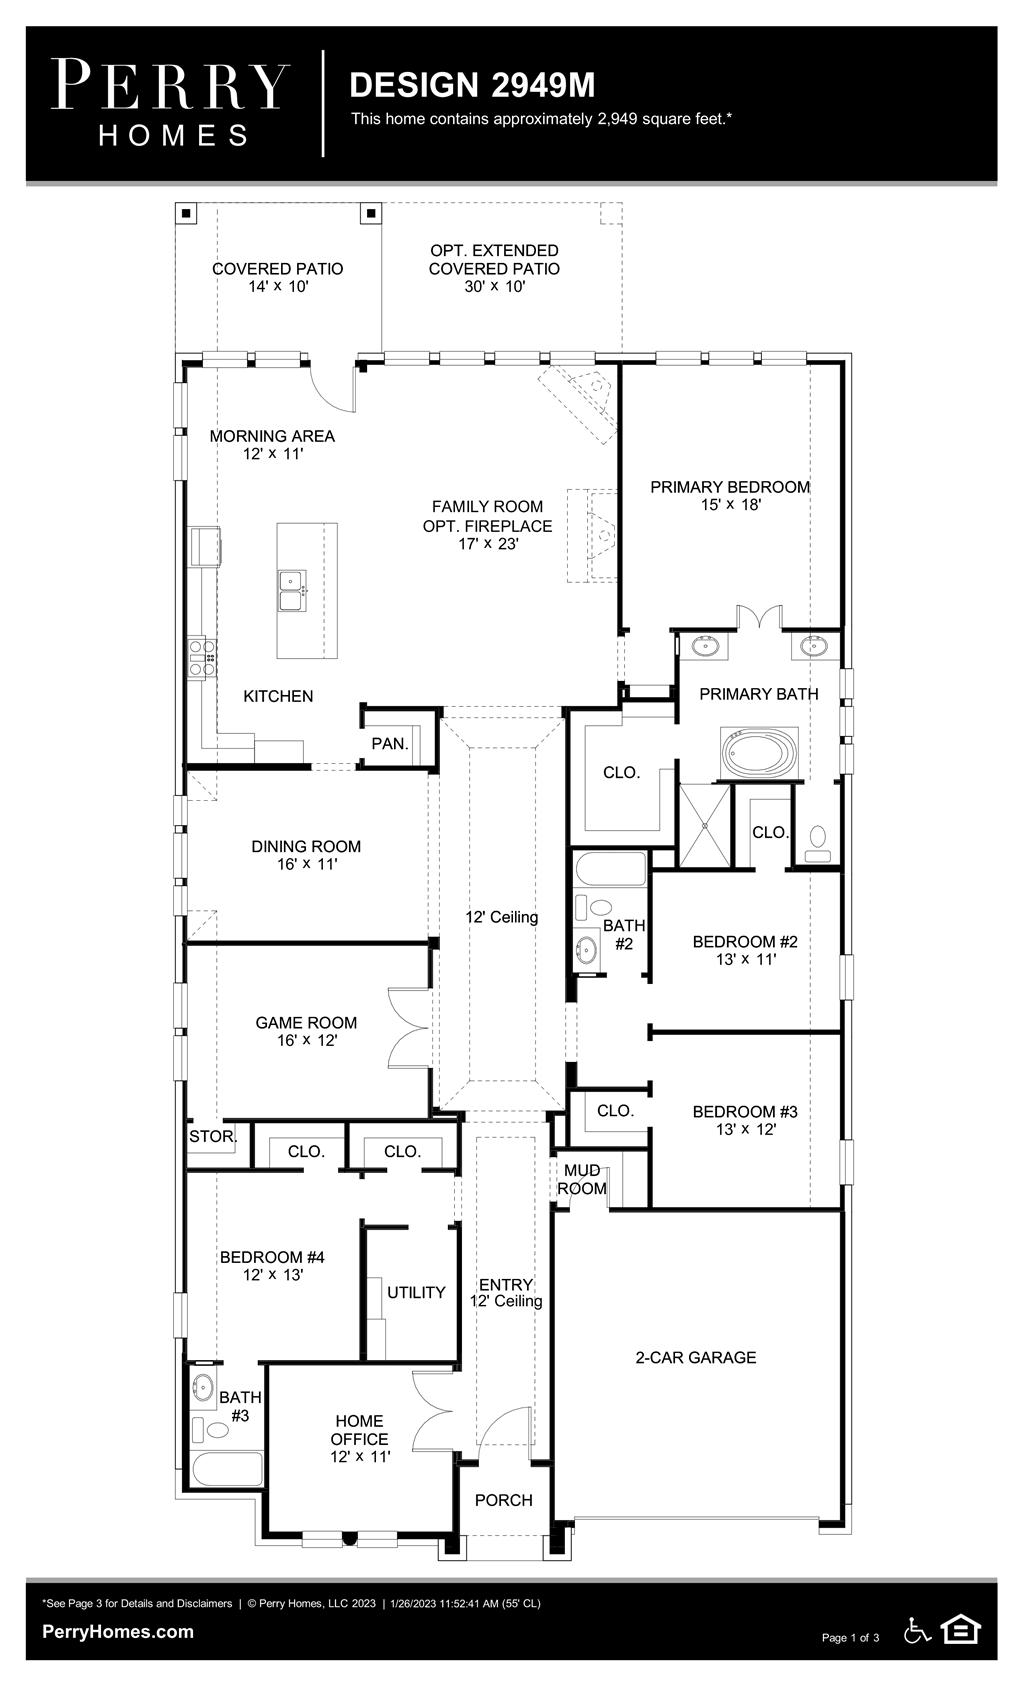 Floor Plan for 2949M